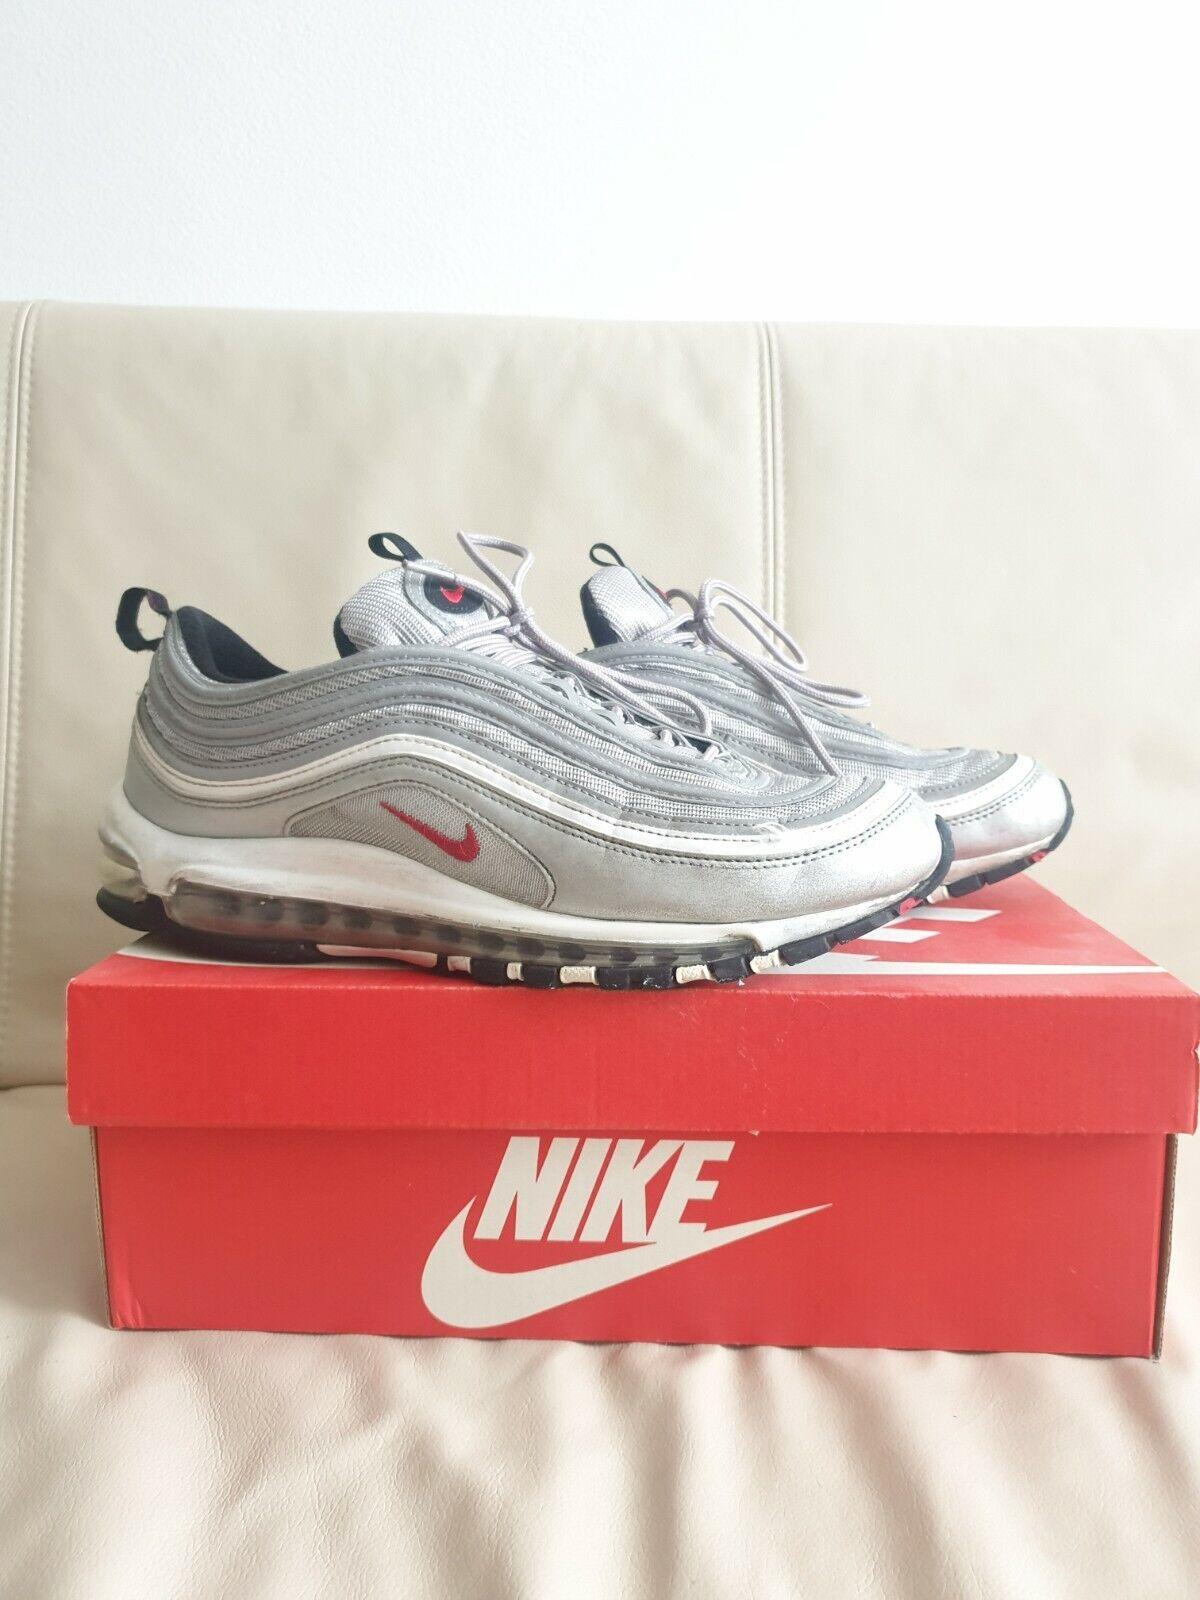 Size 10 - Nike Air Max 97 OG QS 2017 Silver Bullet for sale online ...